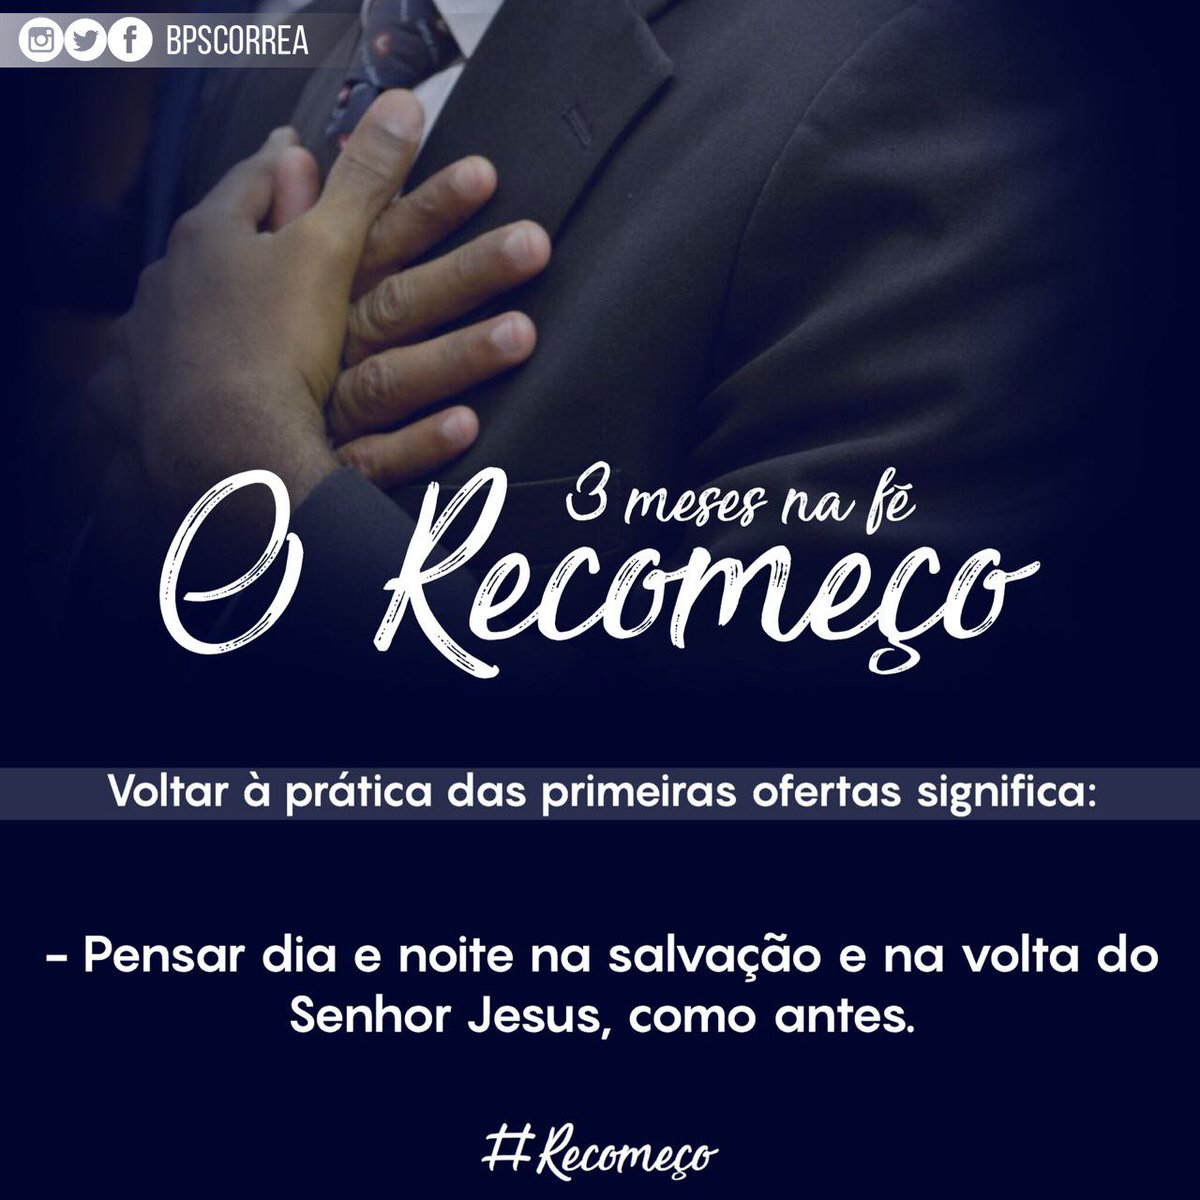 #Recomeço https://t.co/FTSNg7ukdz